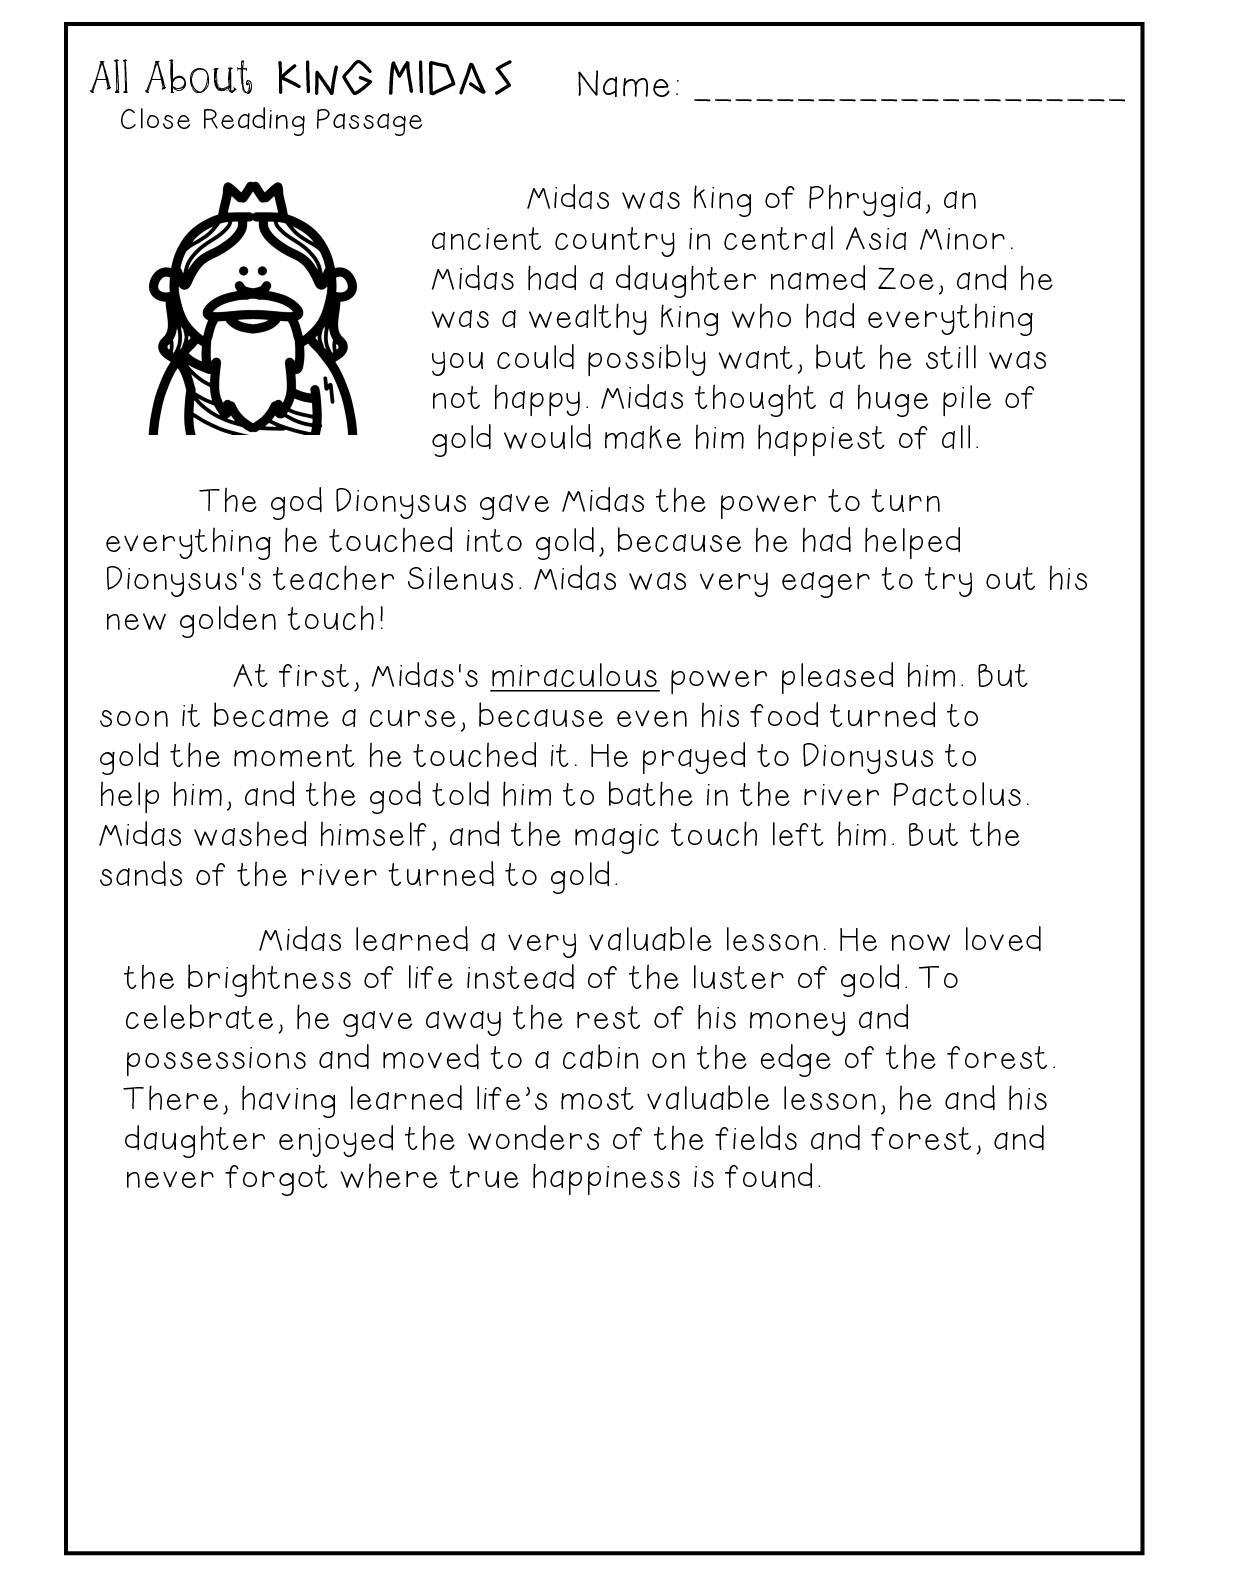 King Midas Greek Myth Close Reading Comprehension Passage